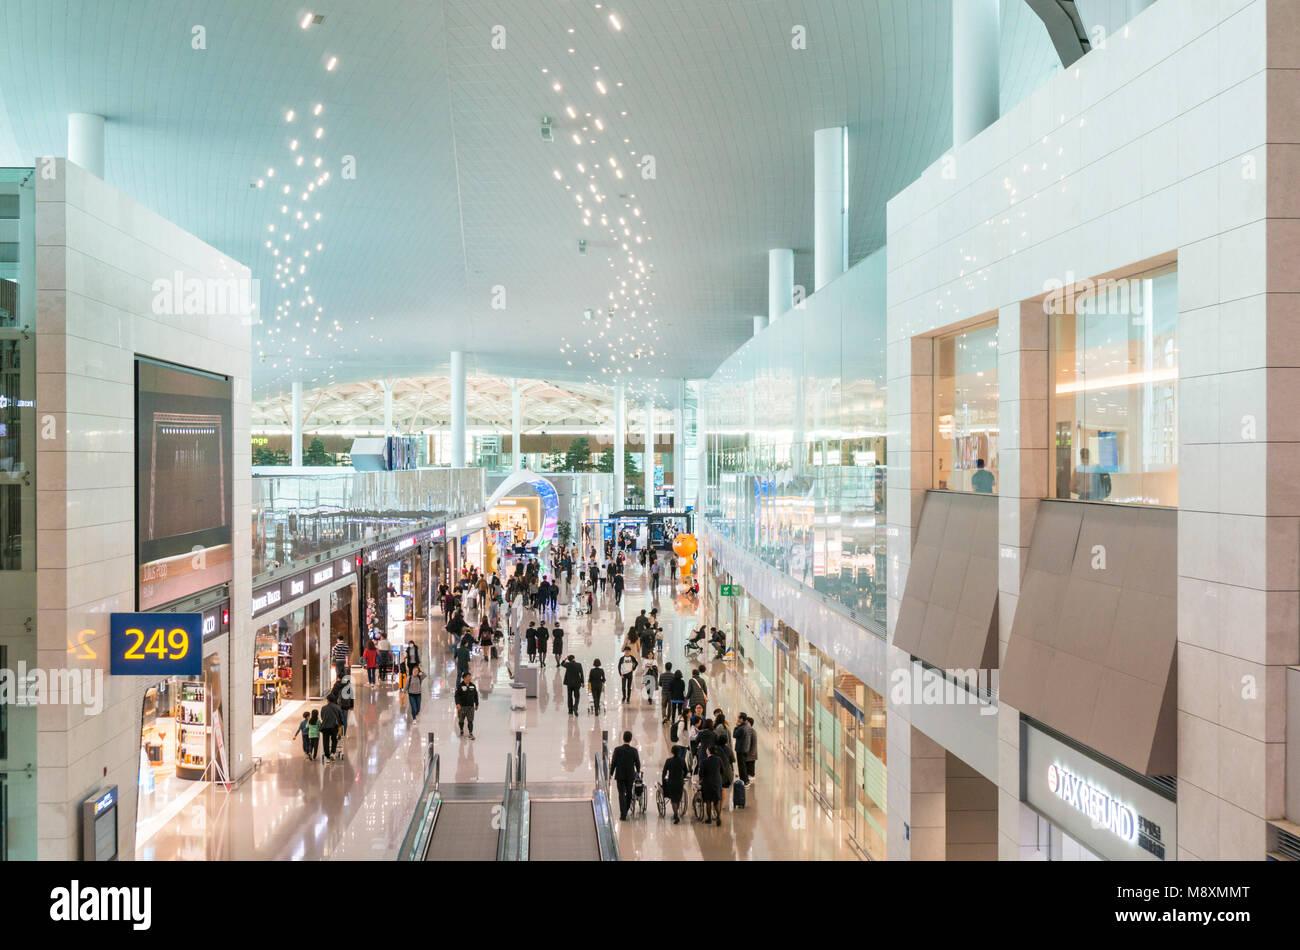 South korea seoul south korea seoul incheon airport terminal 2 seoul airport south korea asia - Stock Image